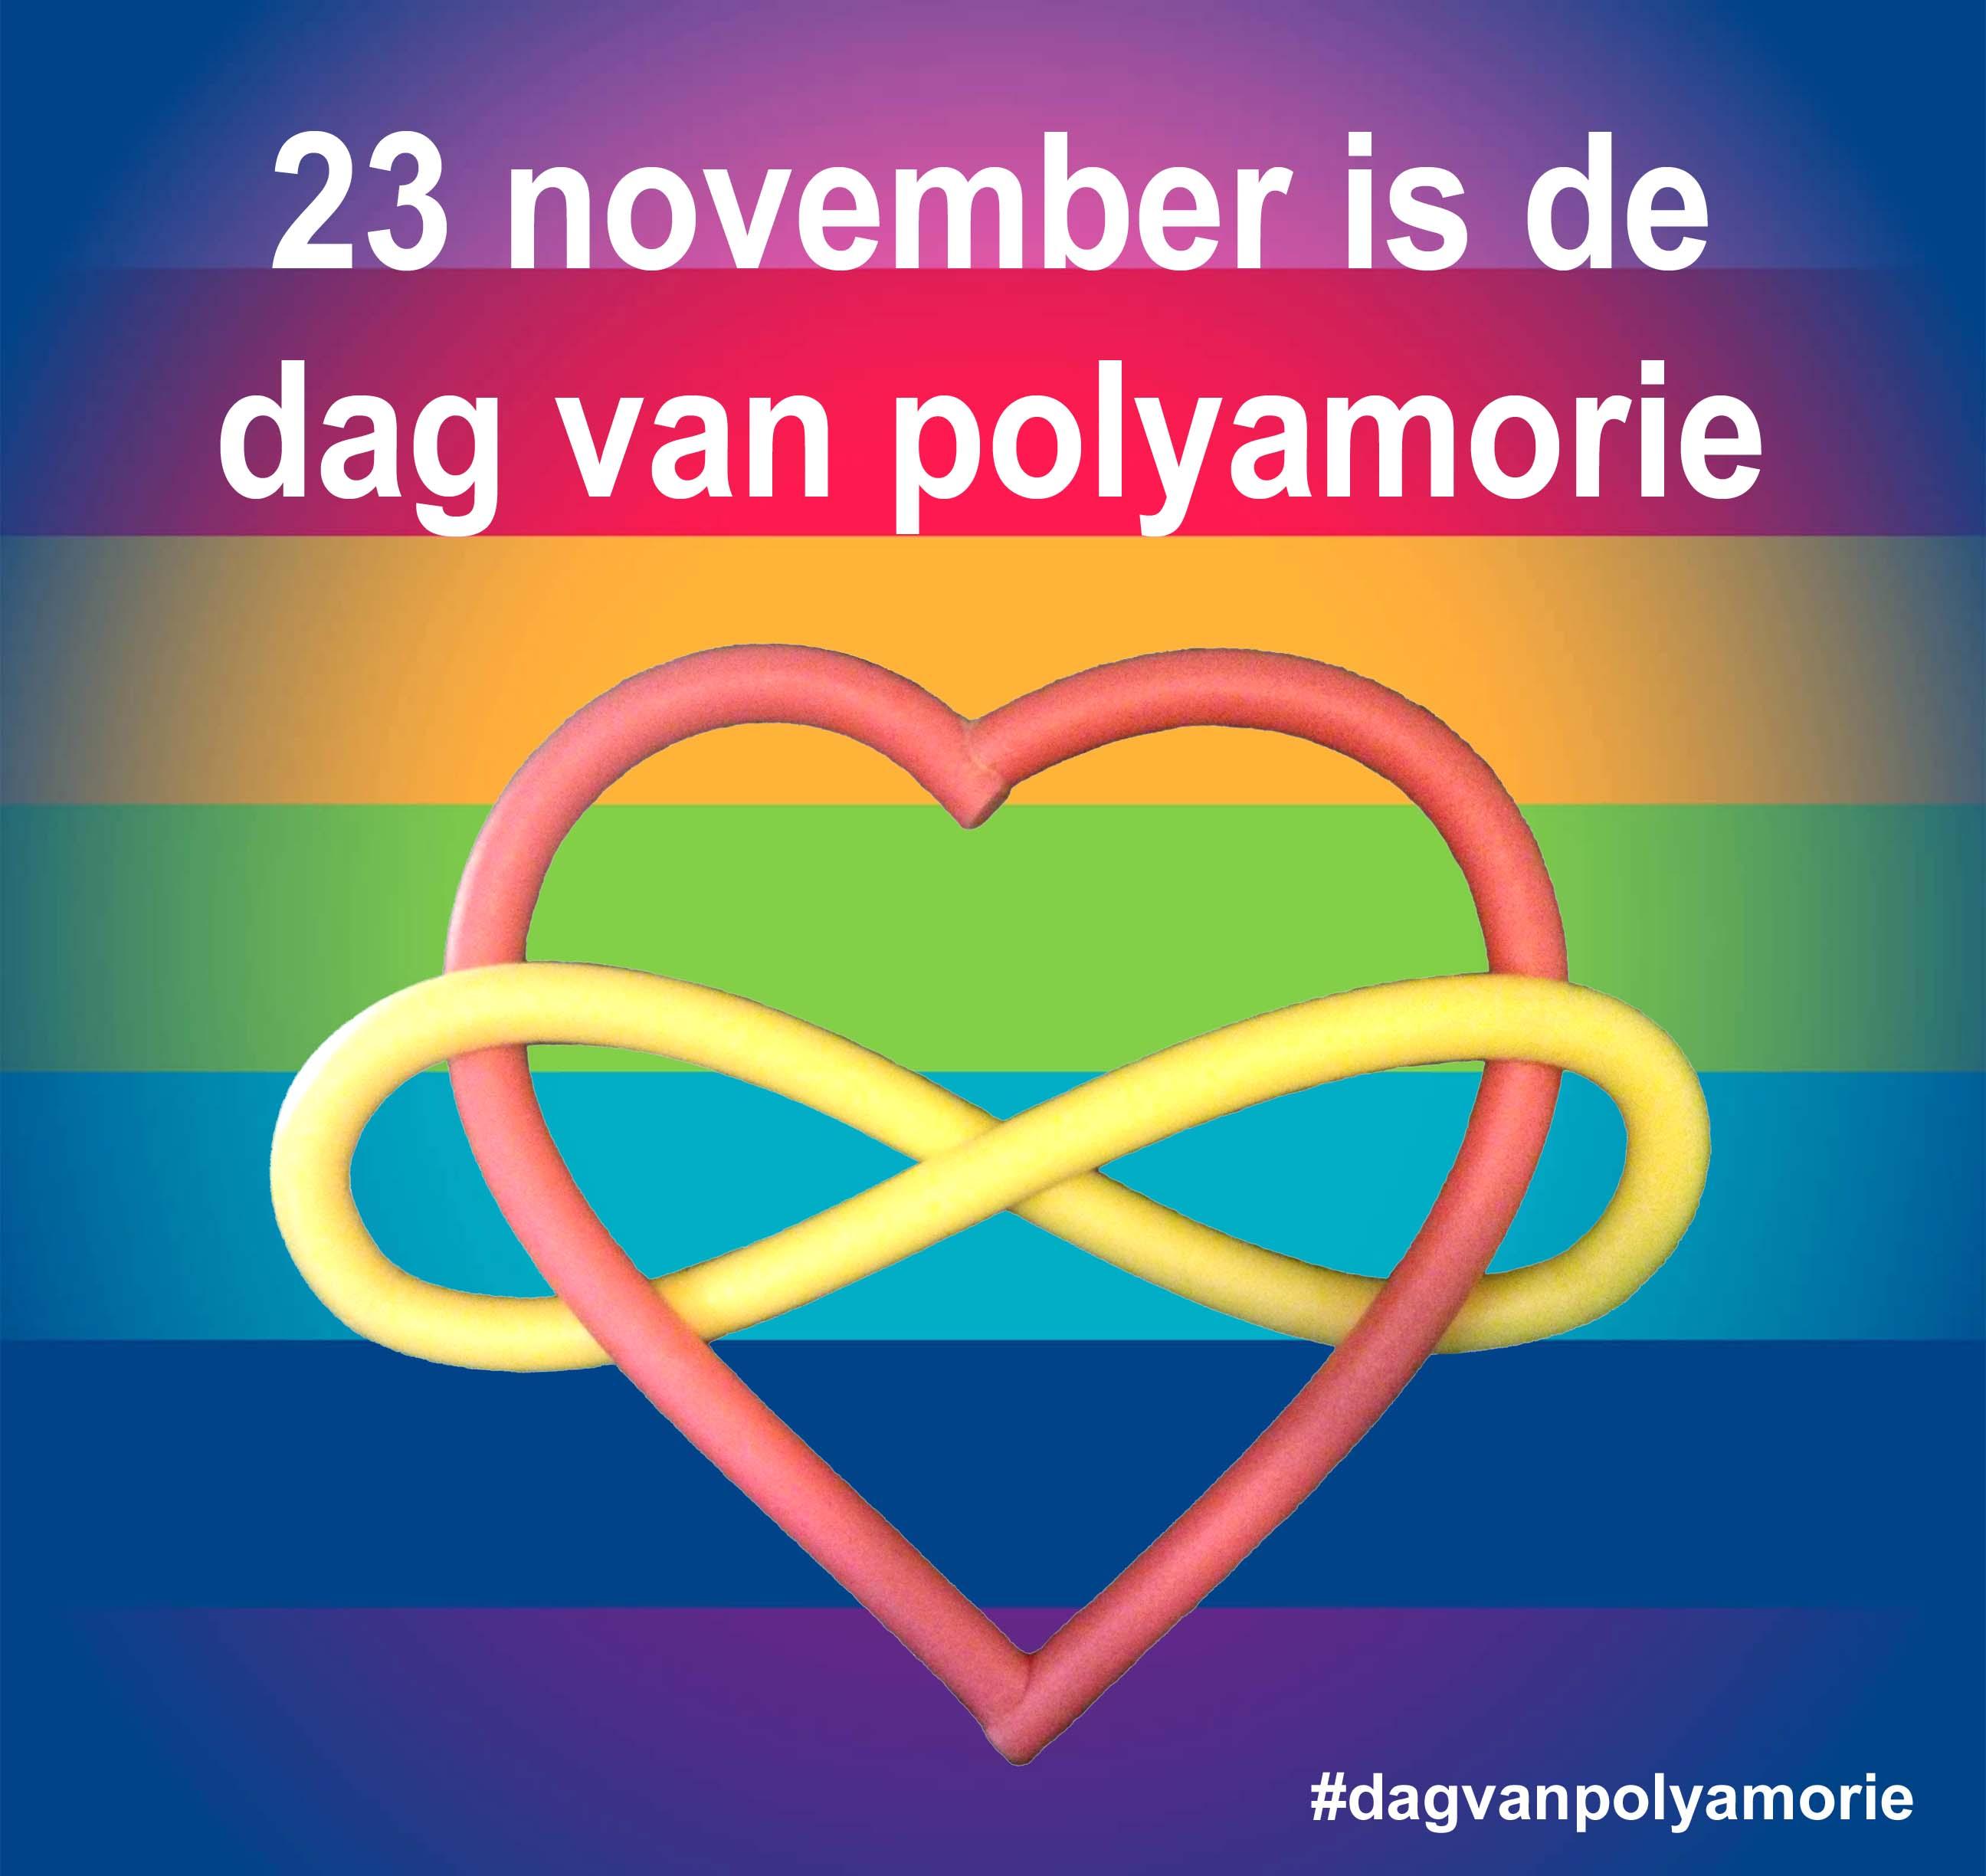 Dag van polyamorie